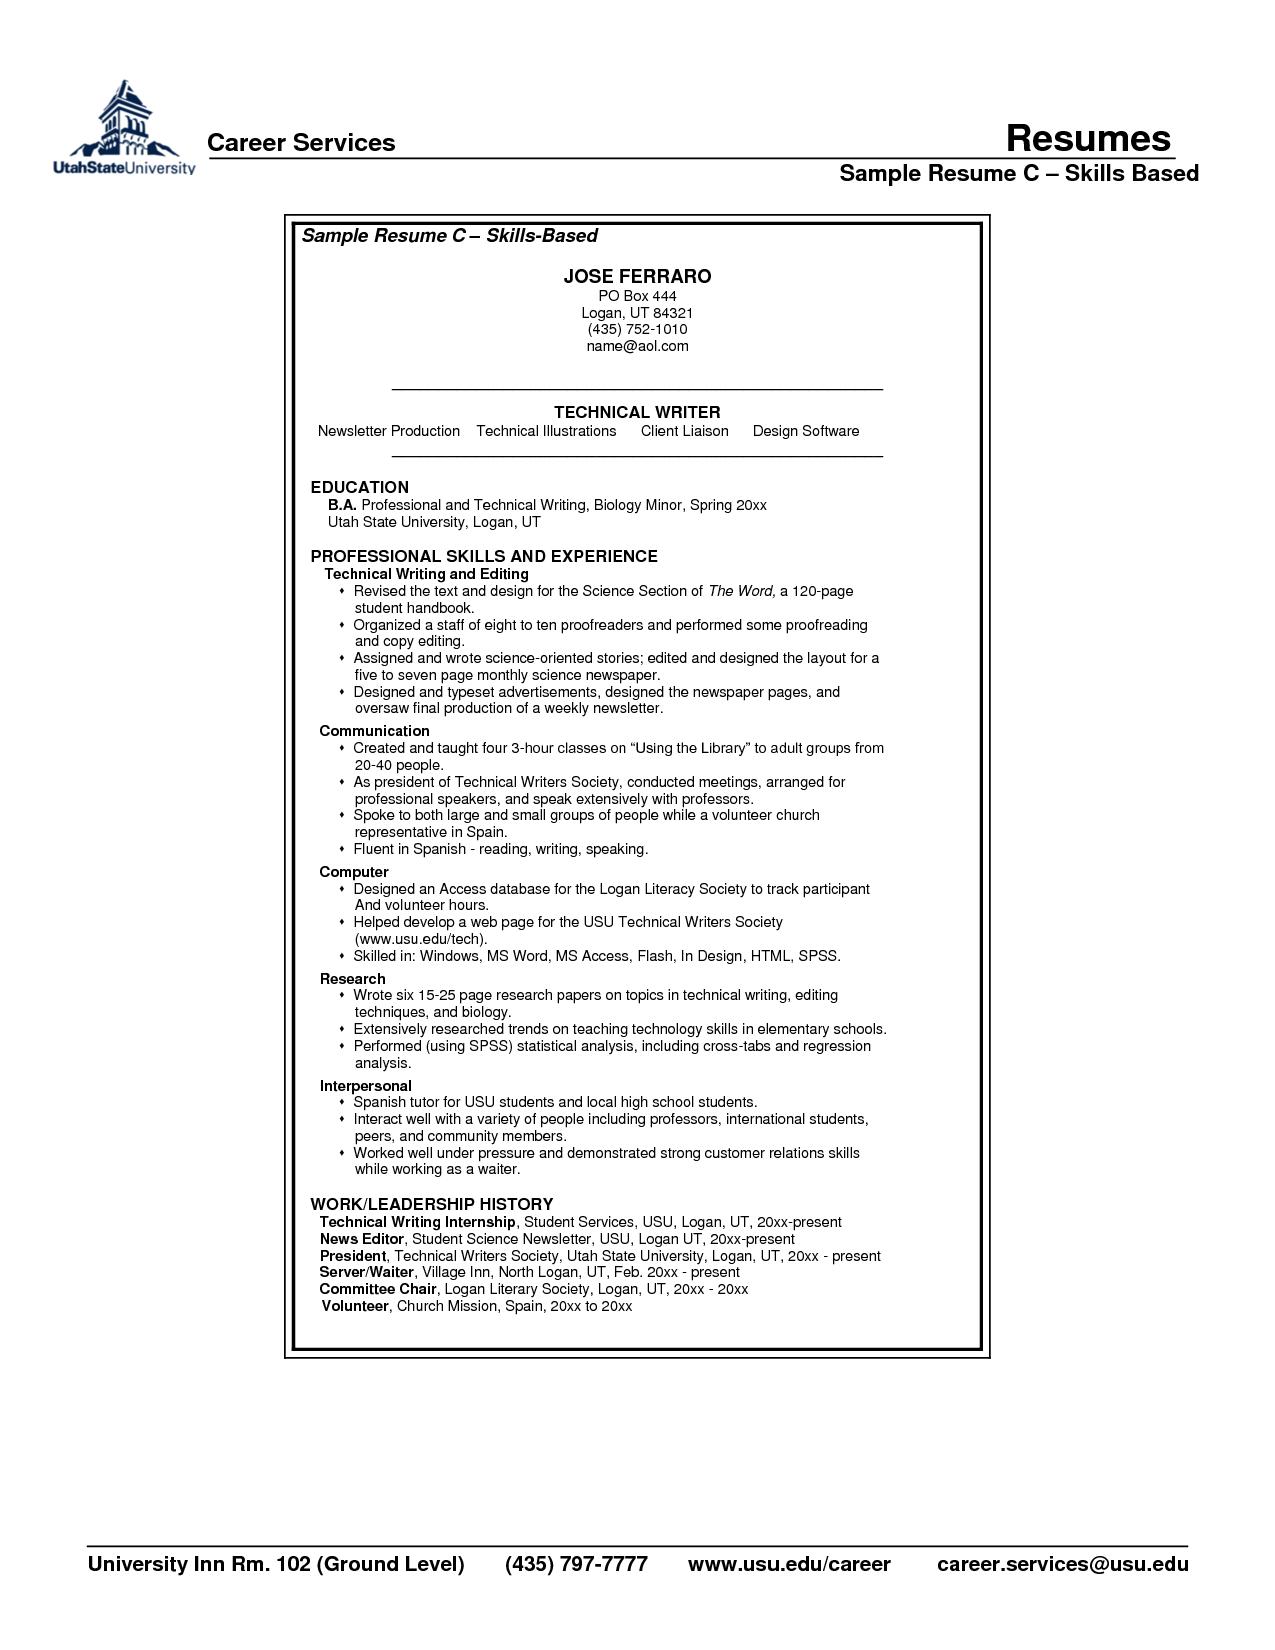 doc computer skills resume samples sample free templates examples